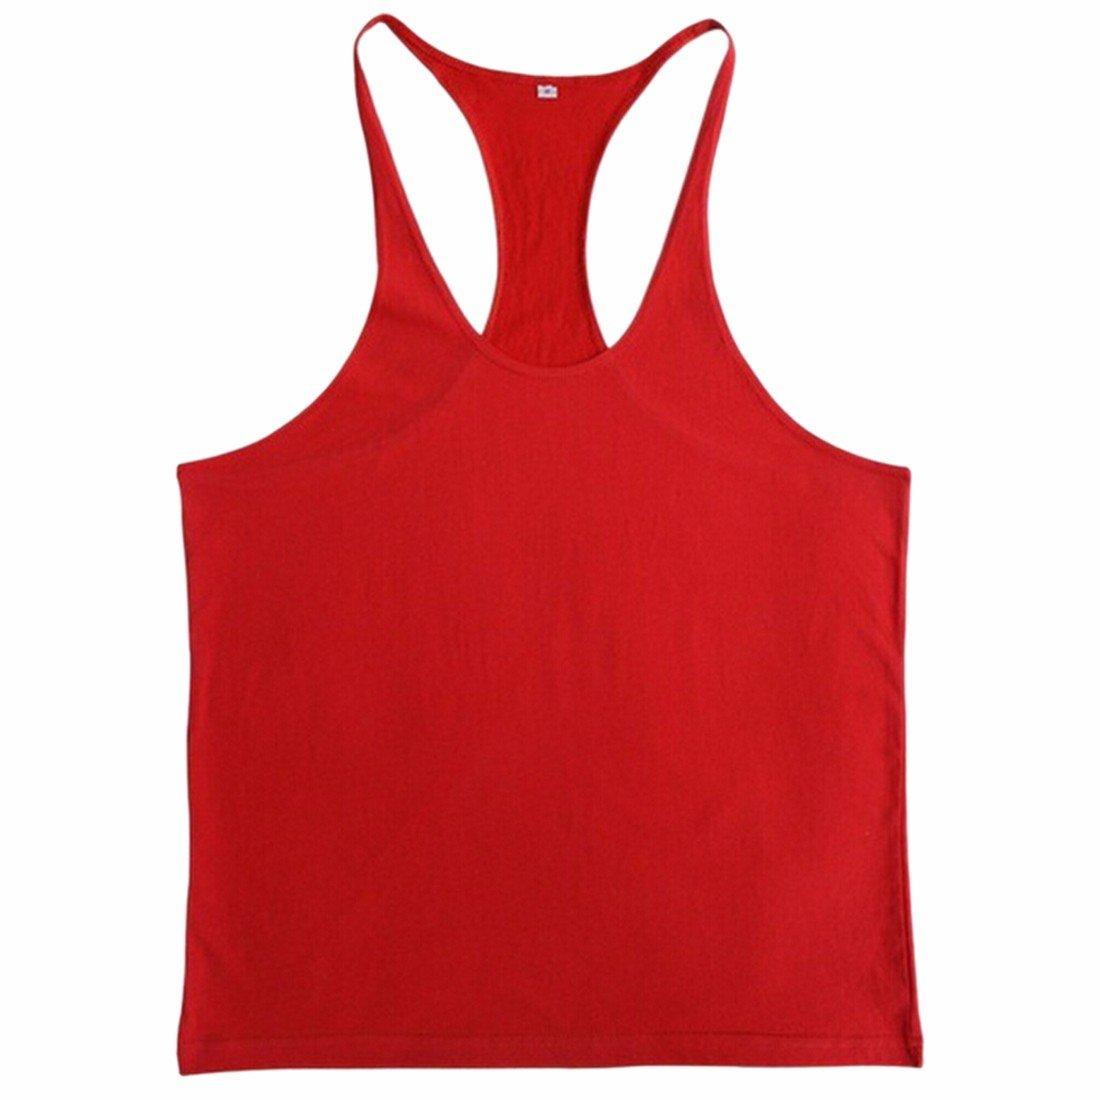 Men Fitness Gym Muscle Vest Tank Tops Undershirt Sleeveless 2011S0022